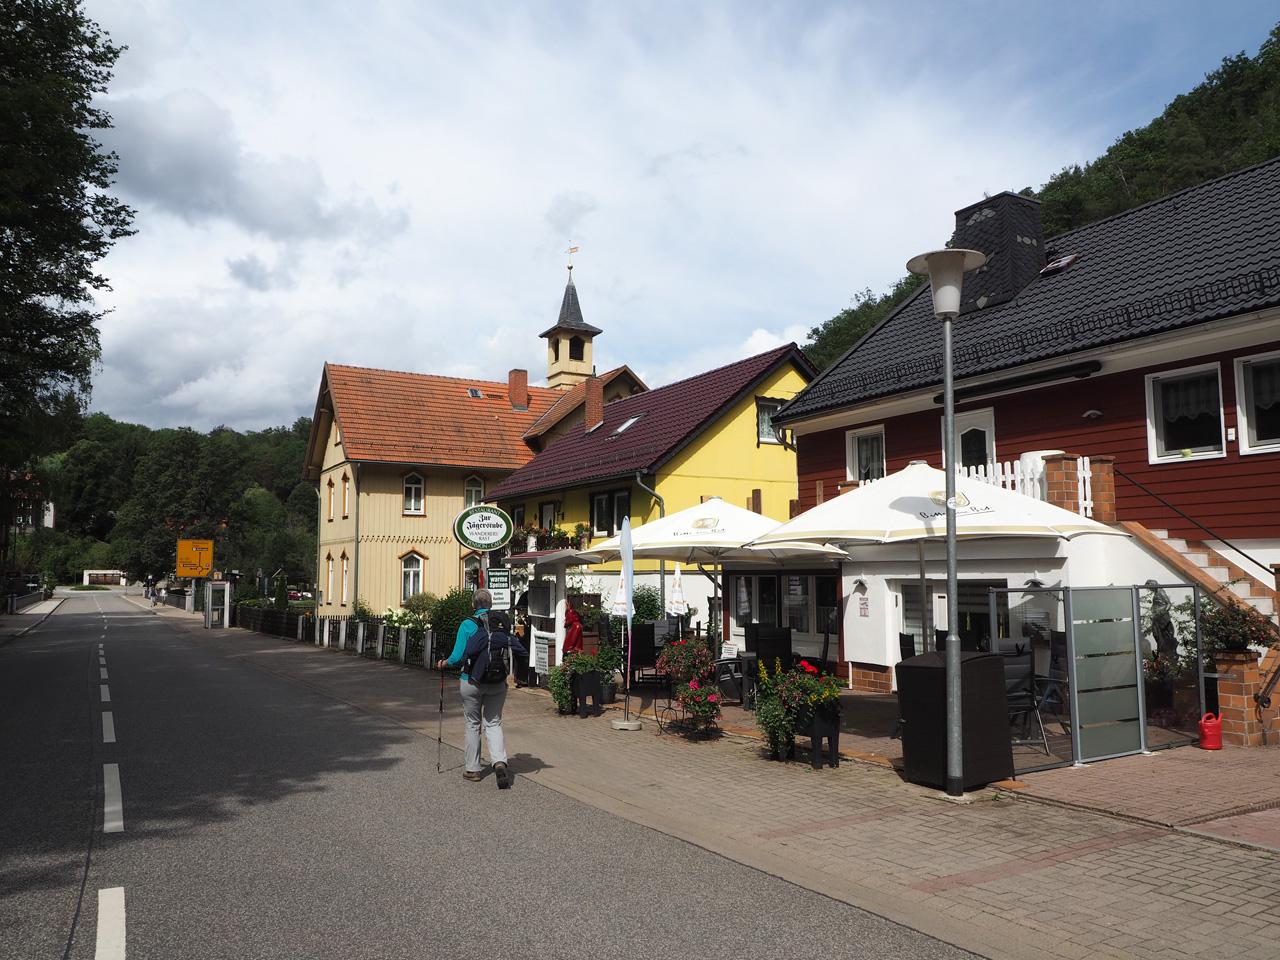 horeca in Treseburg